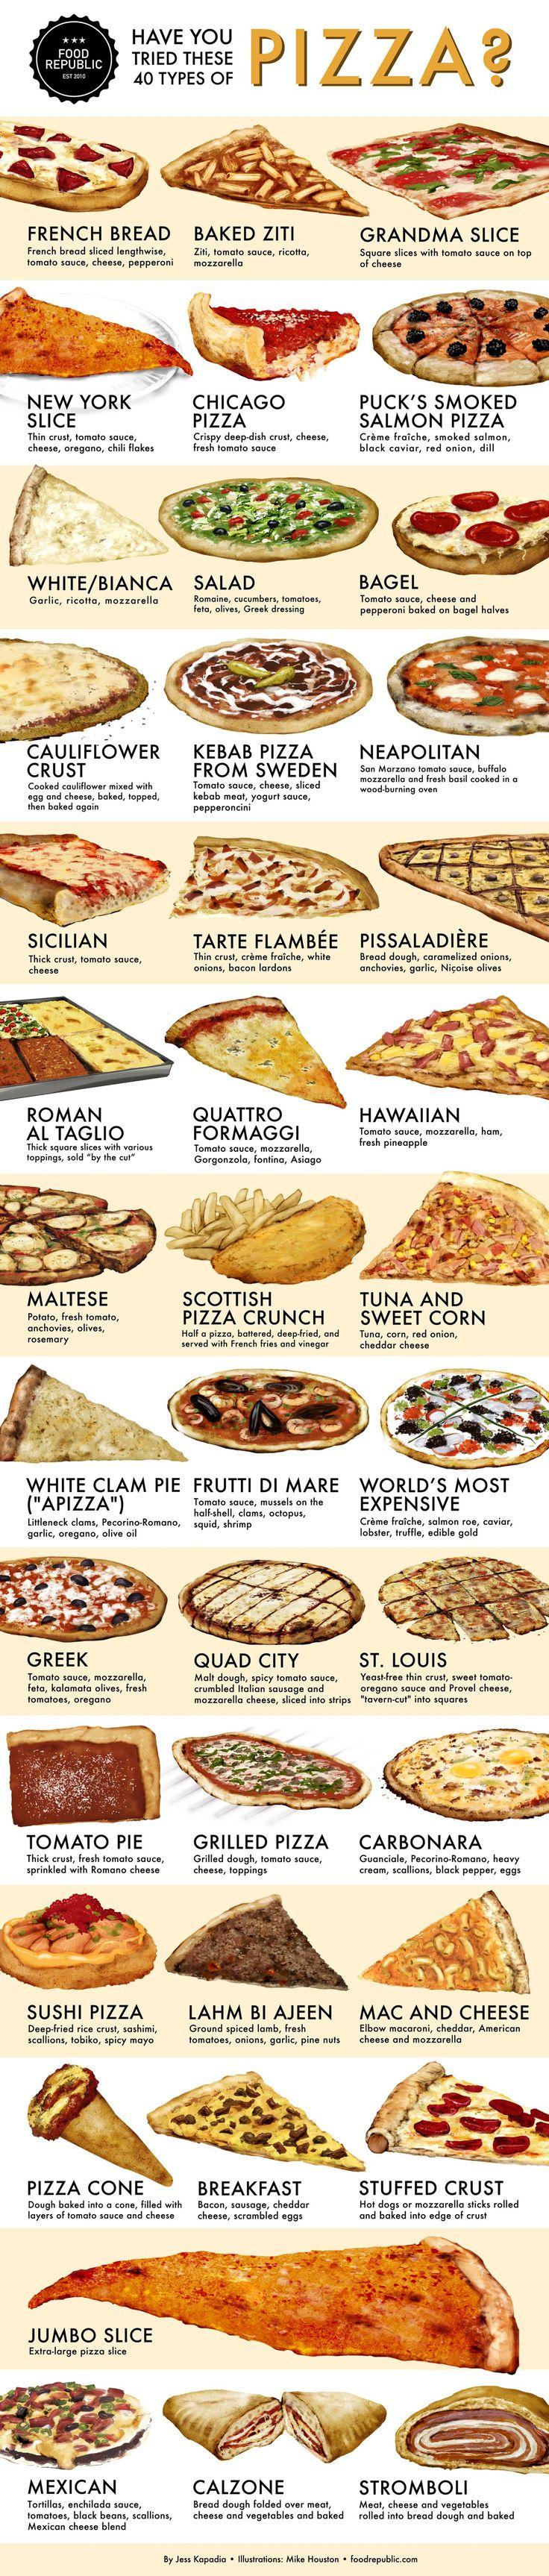 40 Different Pizzas Around the World